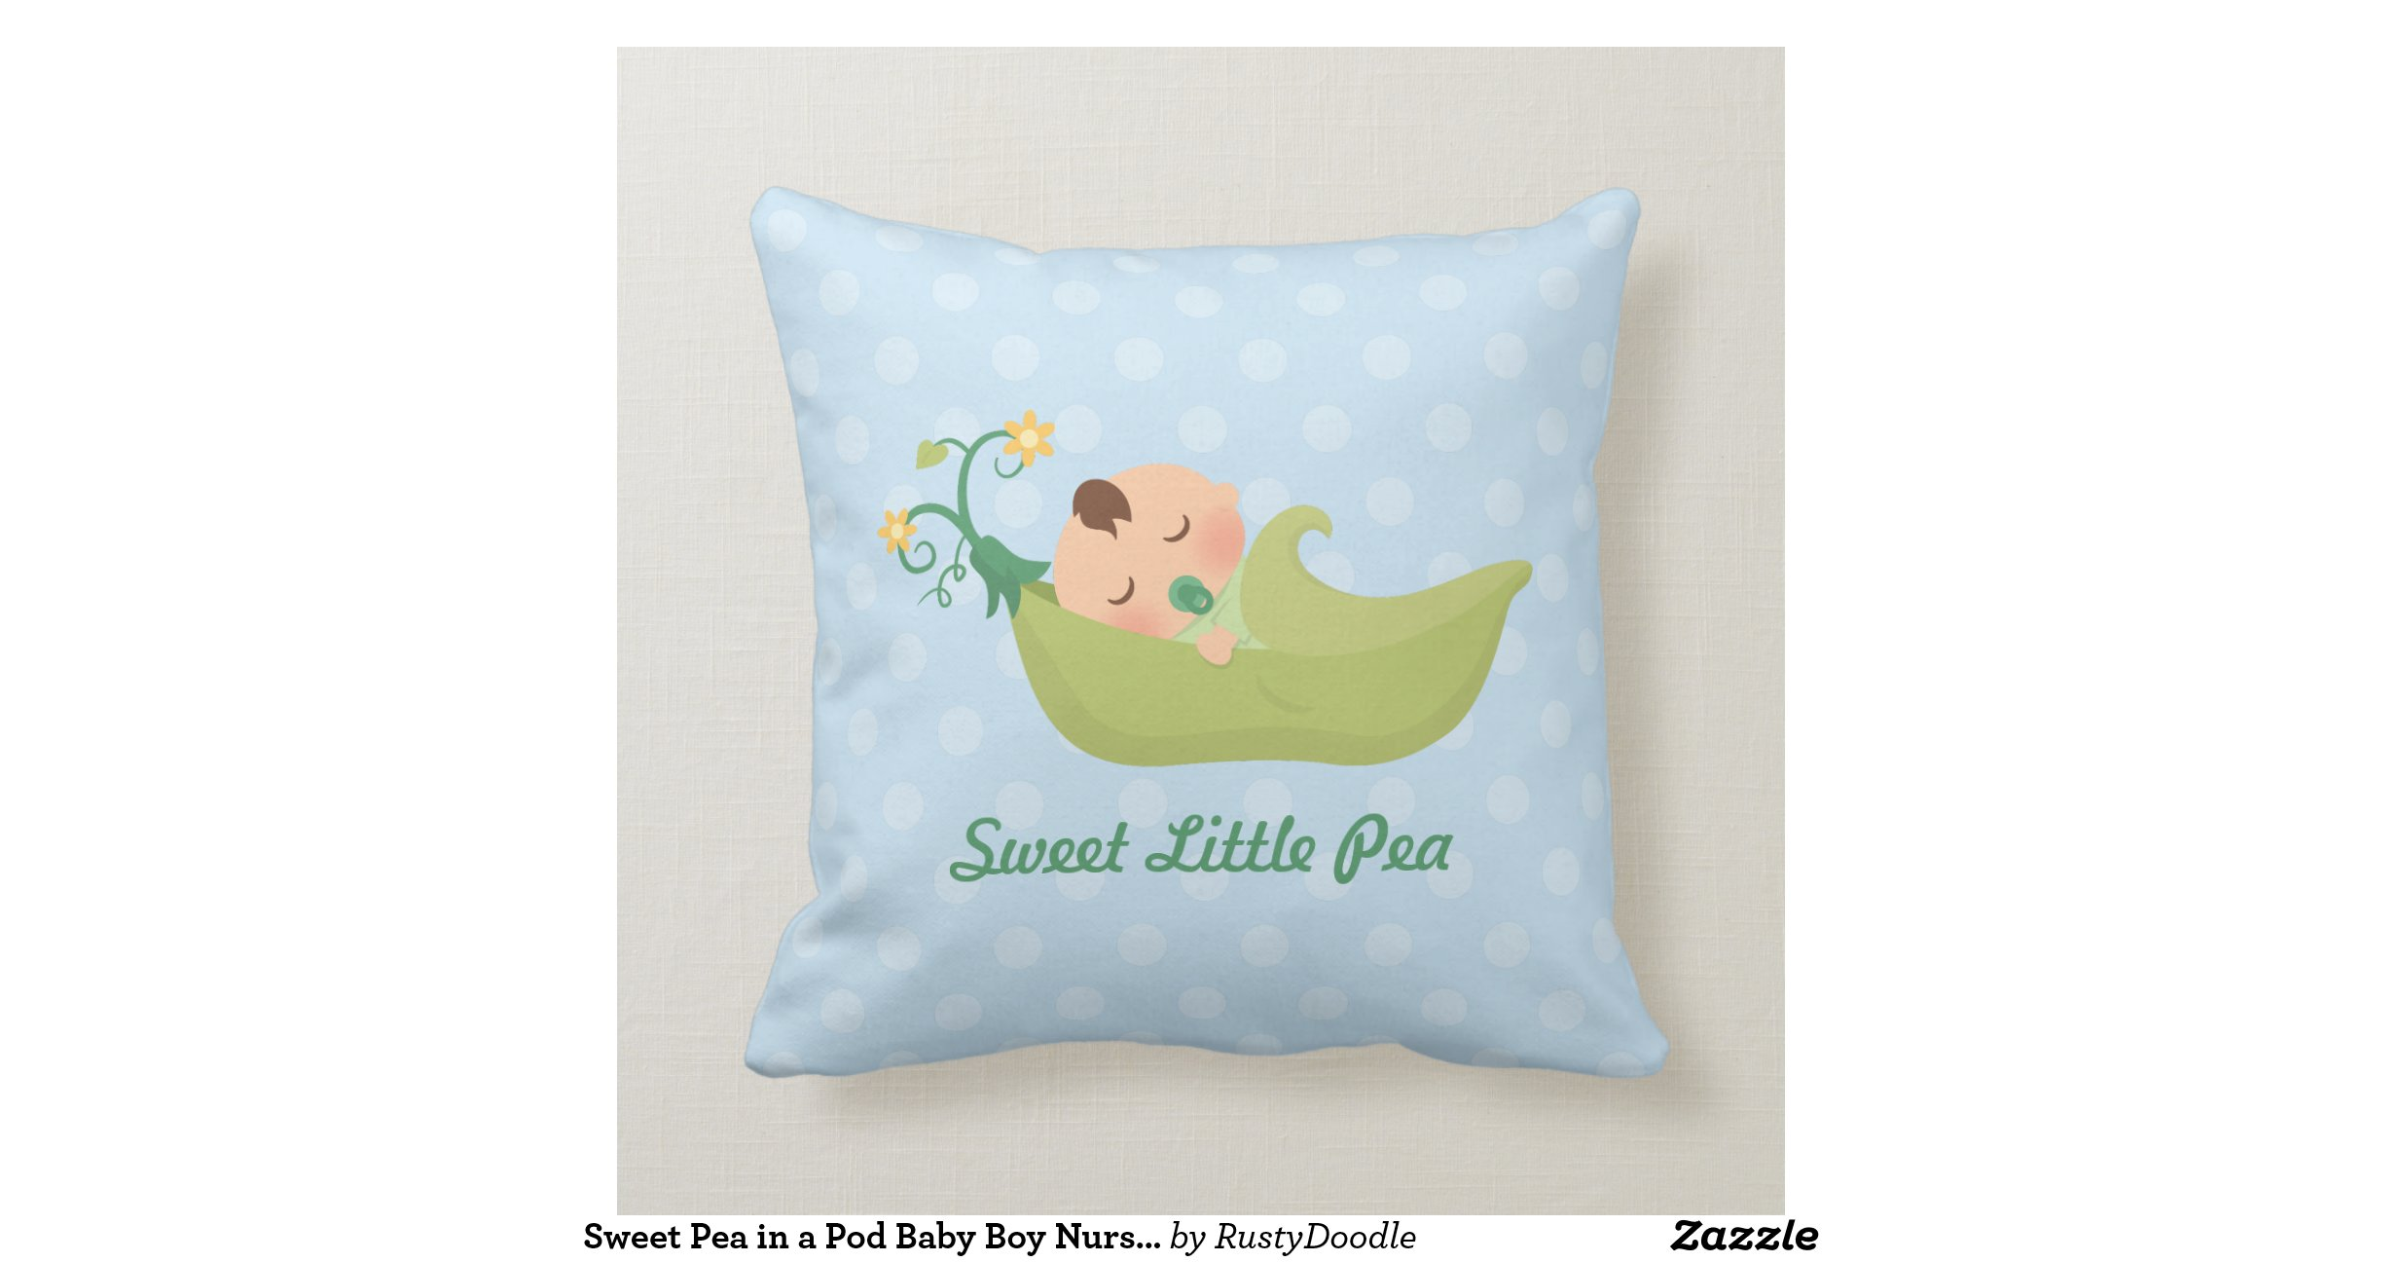 Sweet Pea in a Pod Baby Boy Nursery Room Decor Pillows Zazzle